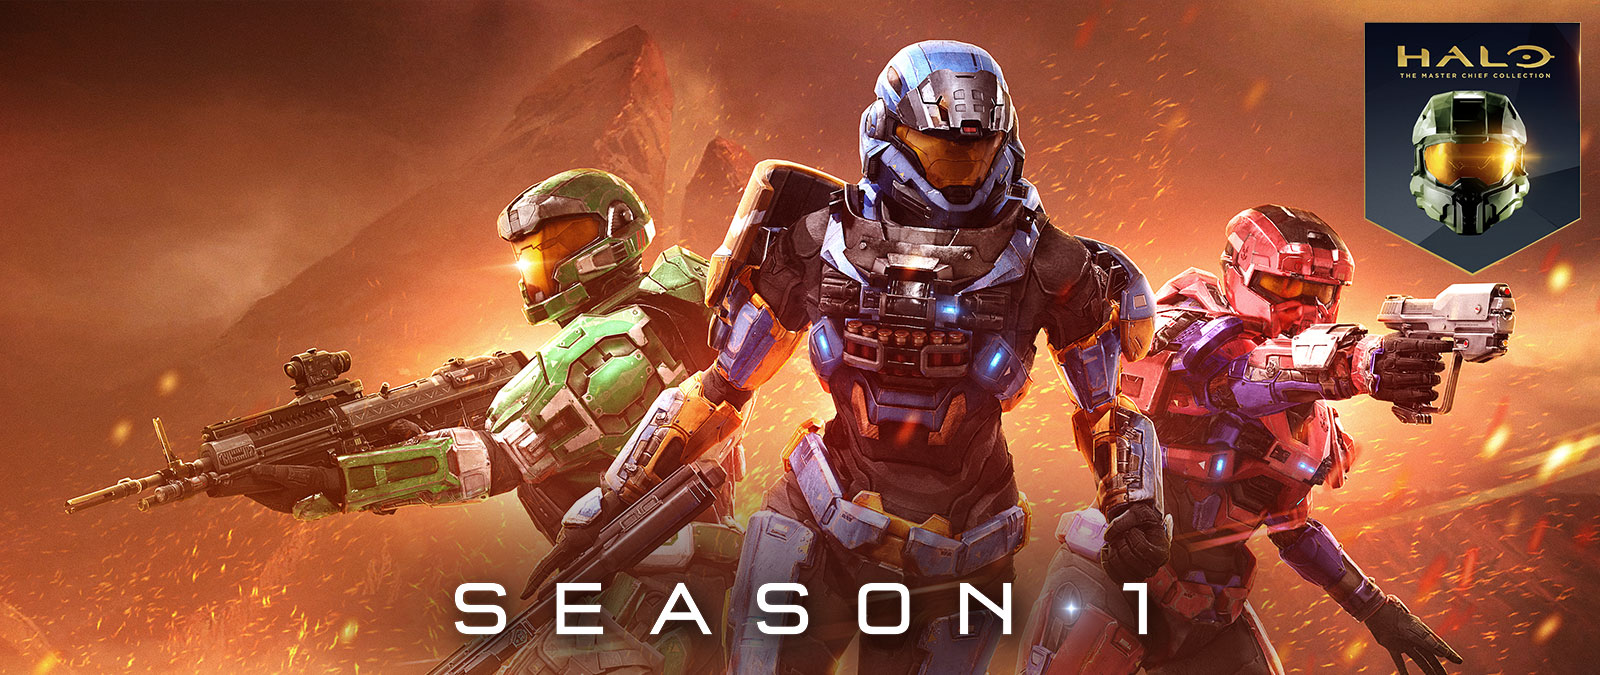 Halo: The Master Chief Collection, Season 1, 3 Χαρακτήρες από το Halo: Reach στέκονται μαζί σε ένα φλεγόμενο τοπίο